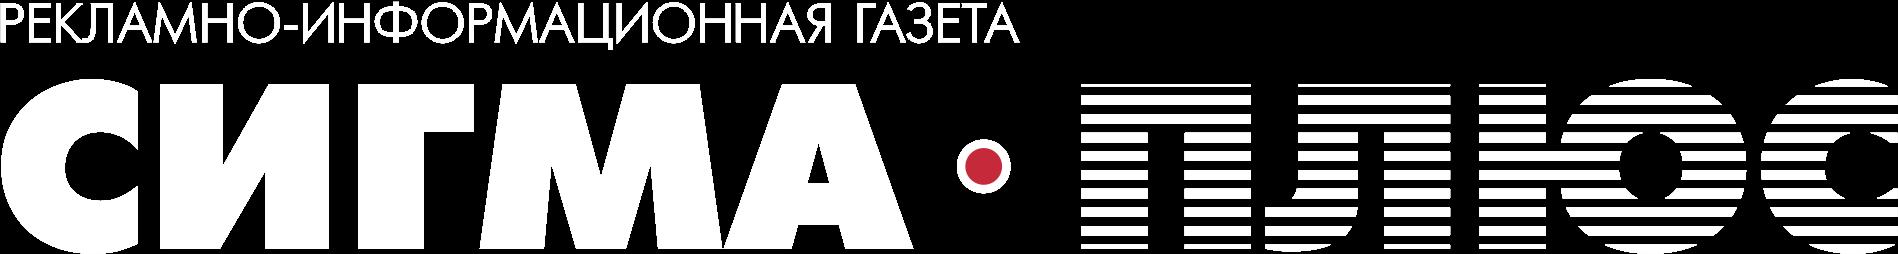 "Ярцево. Pекламно-информационная газета ""Сигма Плюс"""